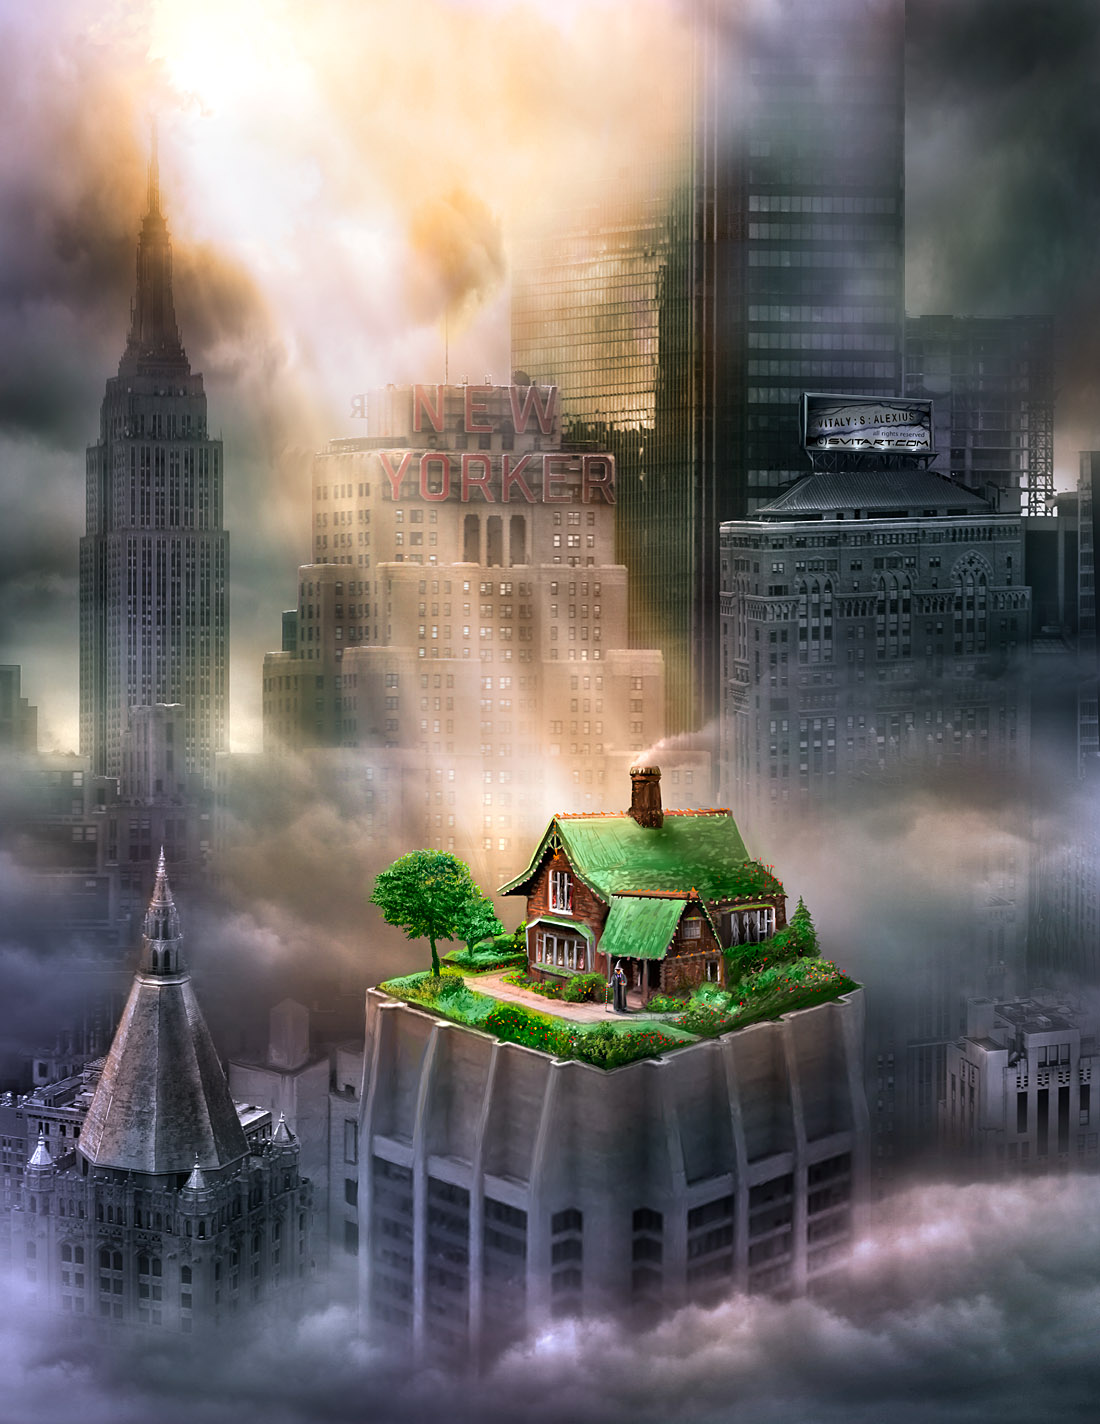 Modern Magic by alexiuss